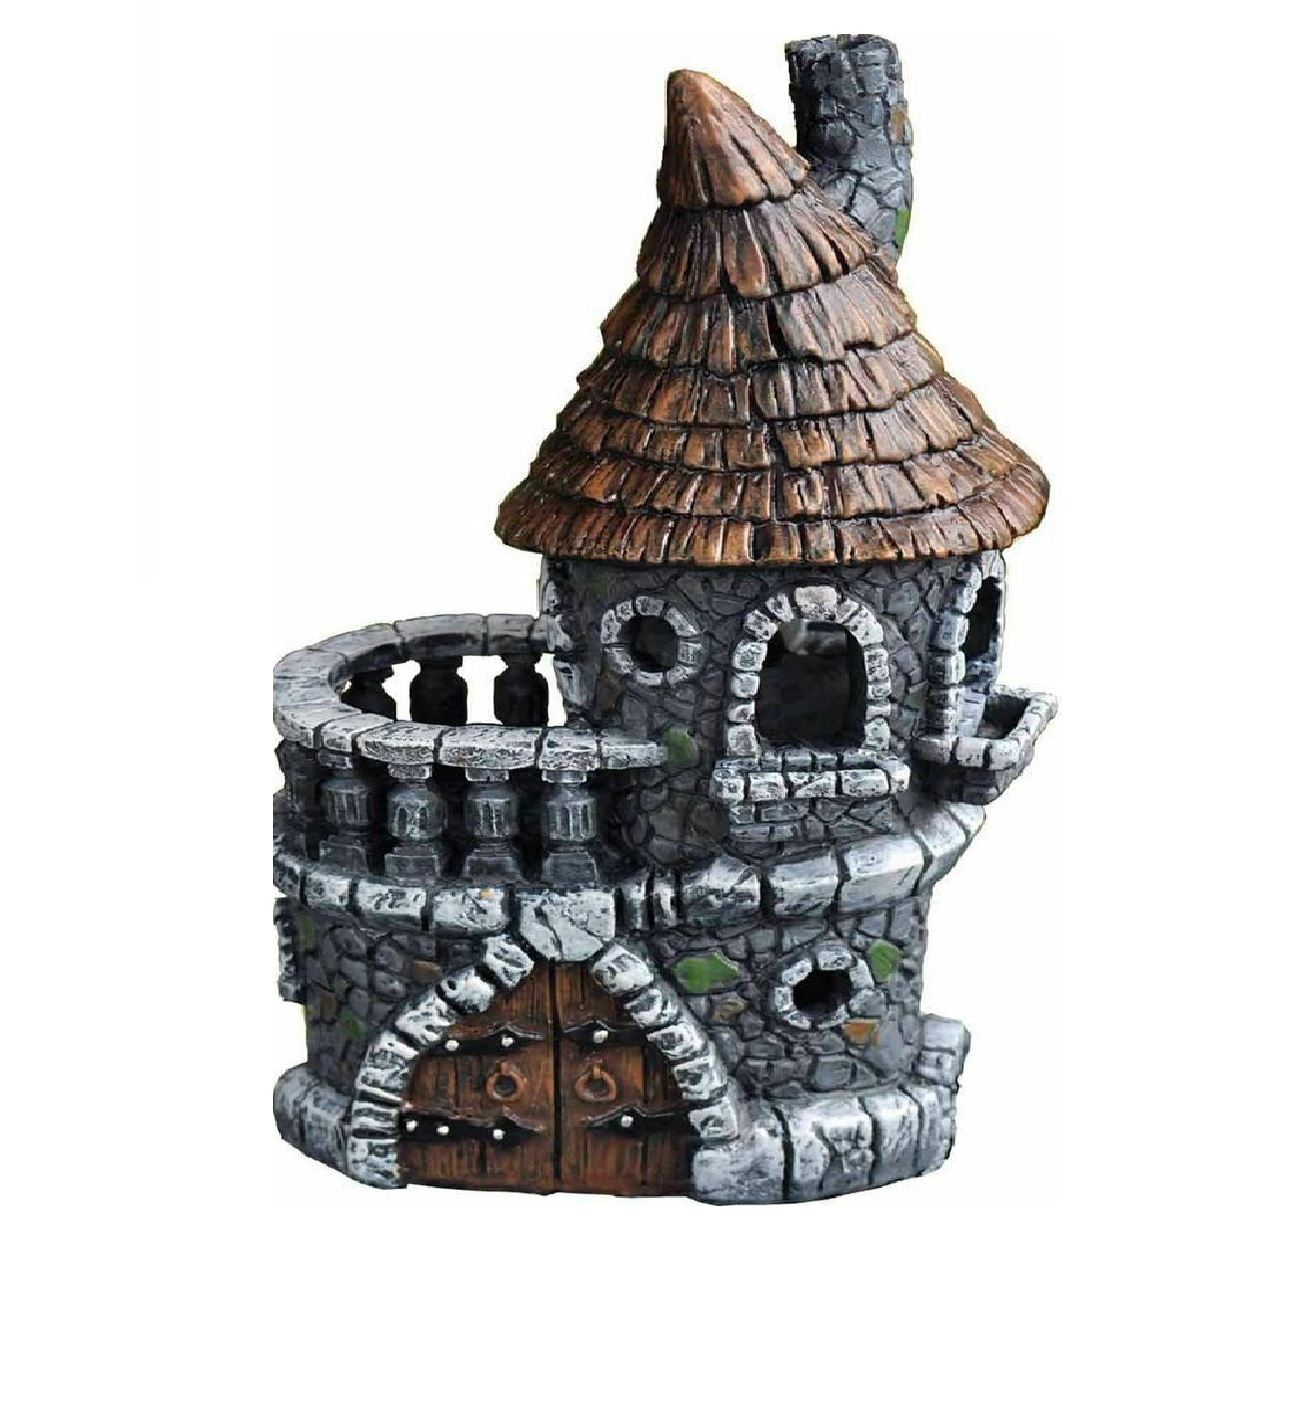 fiddlehead haus mikro mini gro e miniatur h uschen haus feengarten zubeh rteil ebay. Black Bedroom Furniture Sets. Home Design Ideas